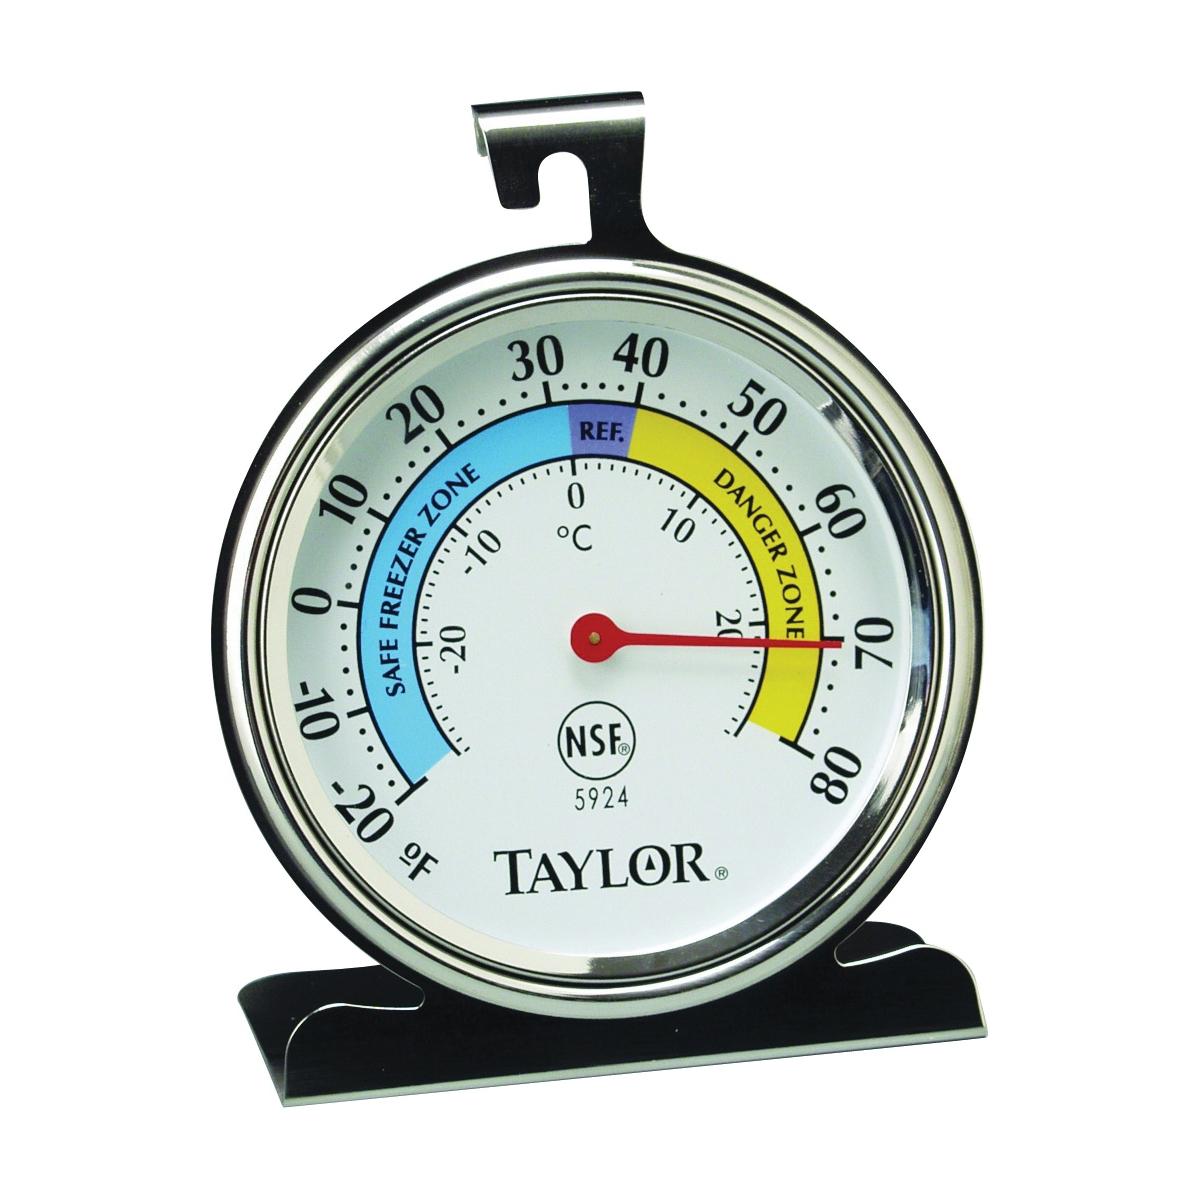 Picture of Taylor 5924 Fridge/Freezer Thermometer, -20 to 80 deg F, Analog Display, White